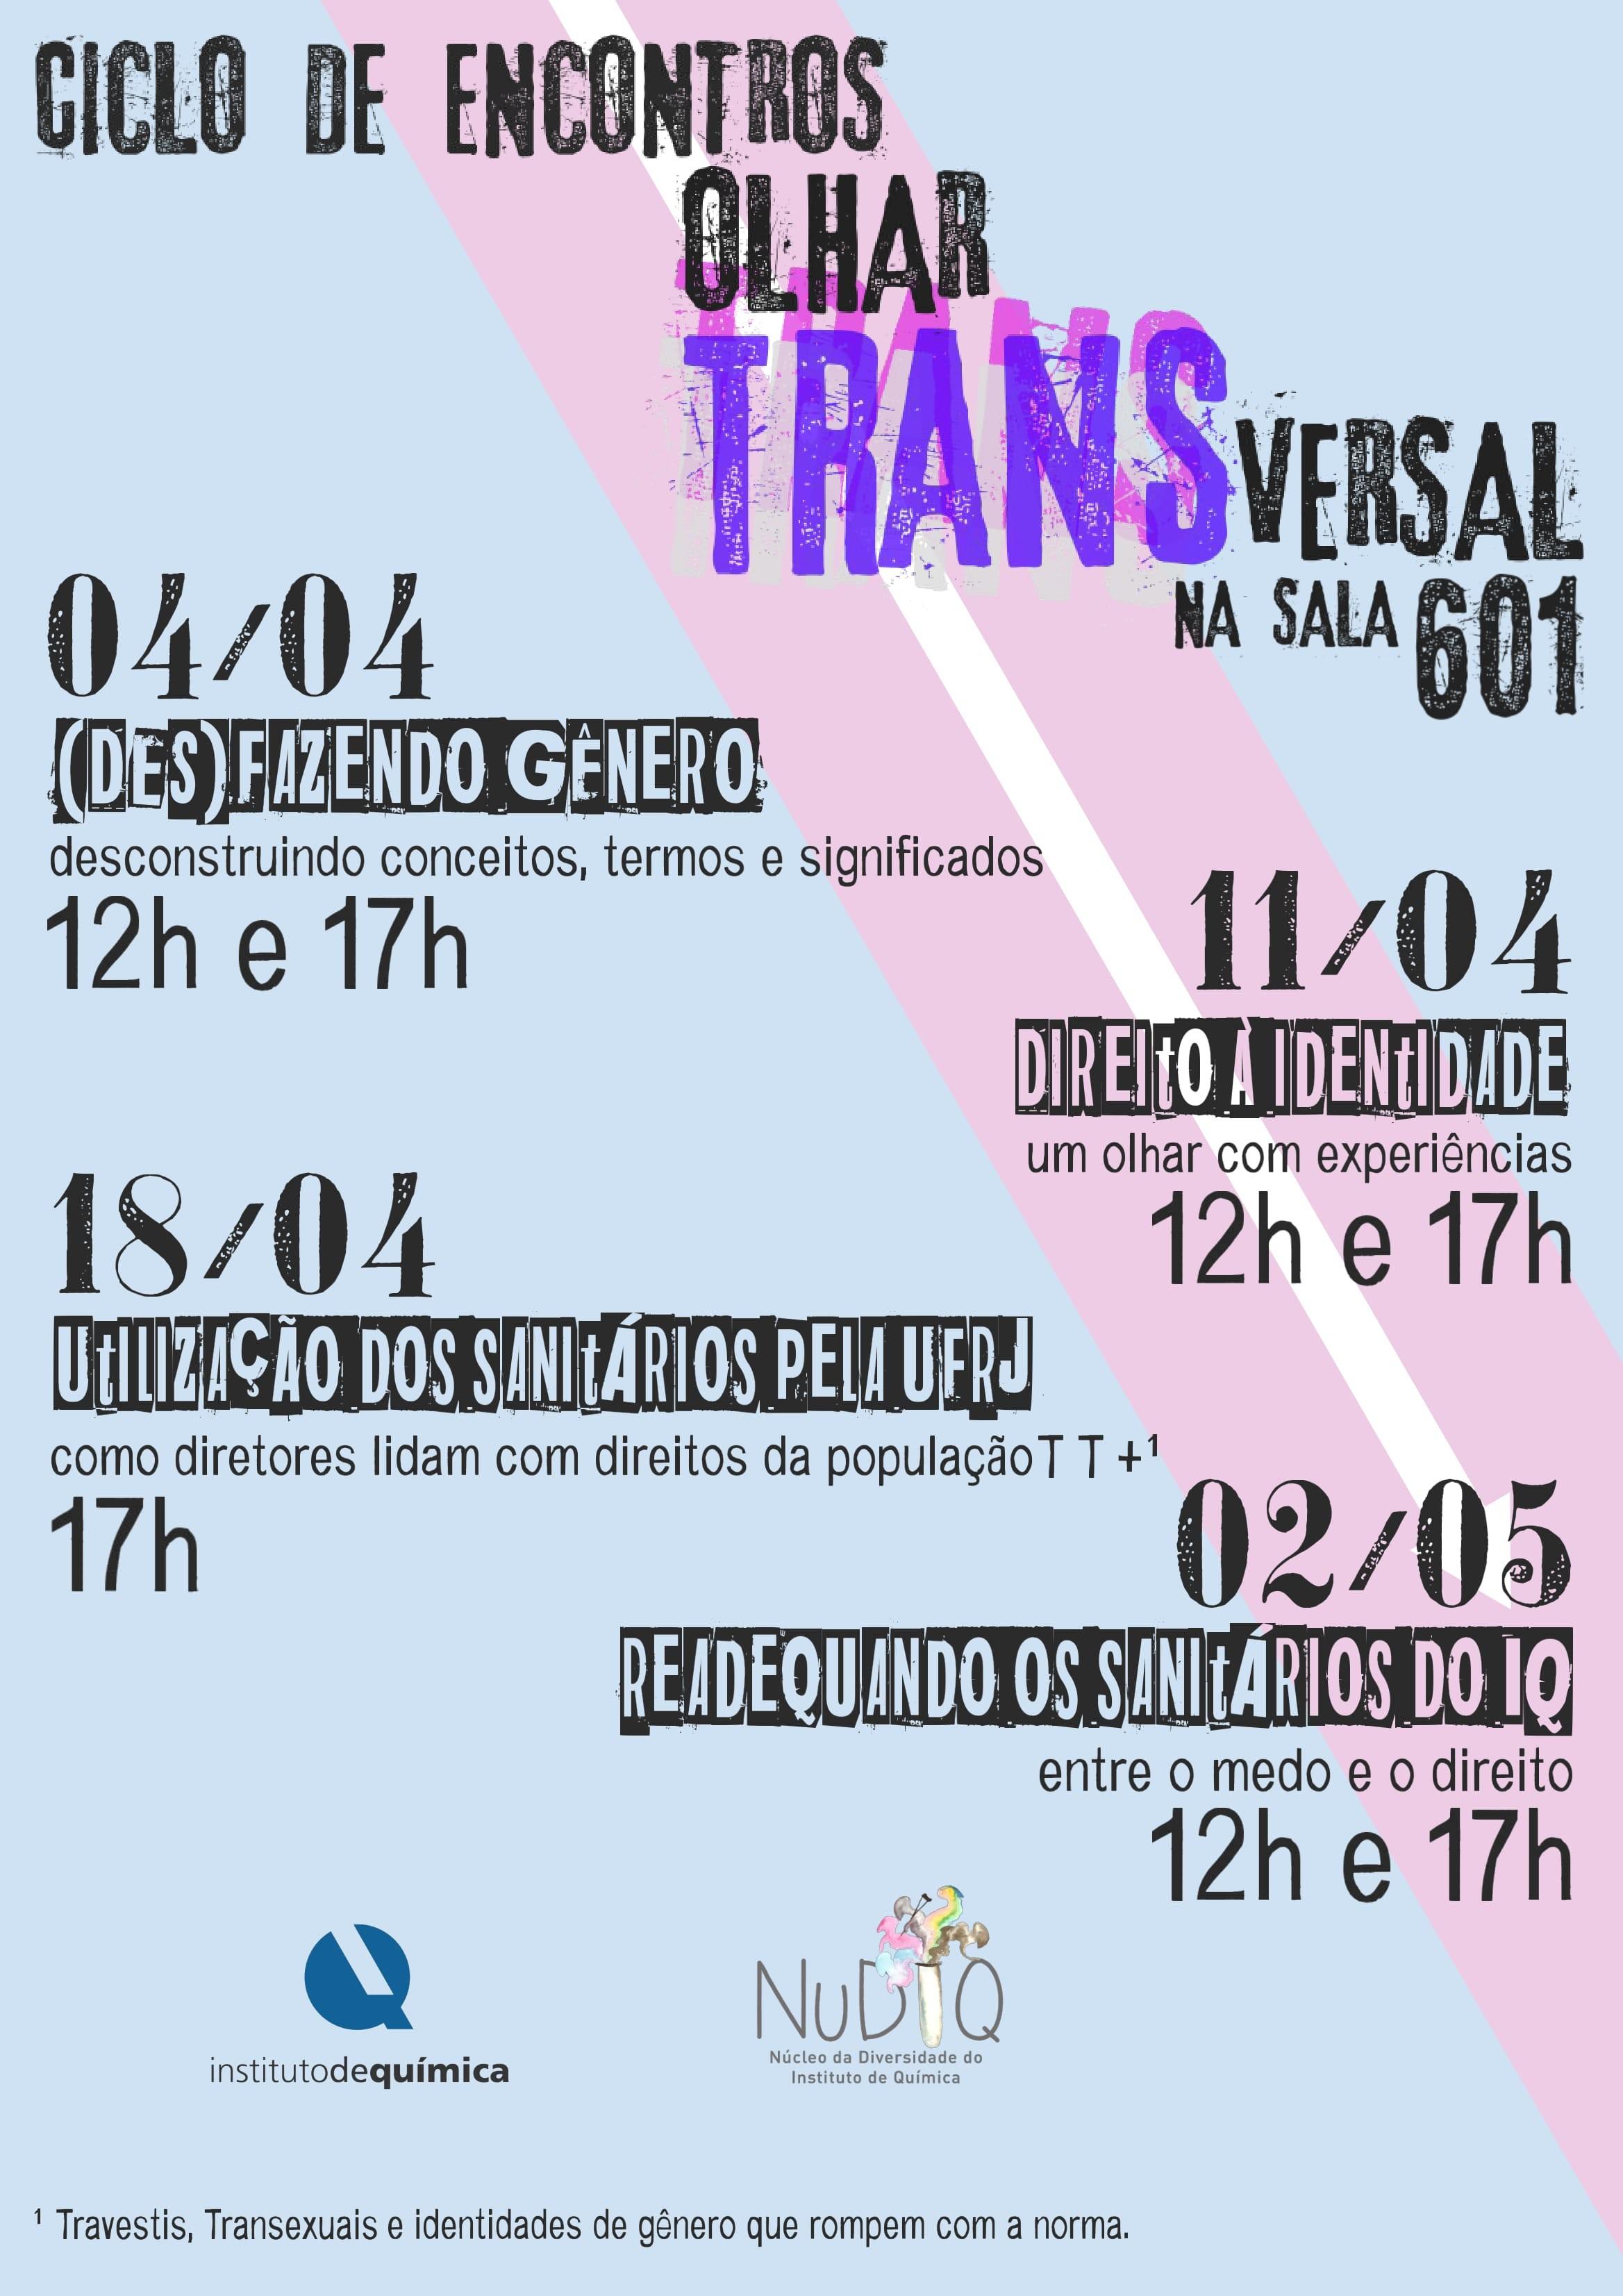 Calendario 2019 Brasileiro Vetor Más Recientes Notcias Do Iq Of Calendario 2019 Brasileiro Vetor Mejores Y Más Novedosos Revisar Calendario 2019 Feriados Brasil